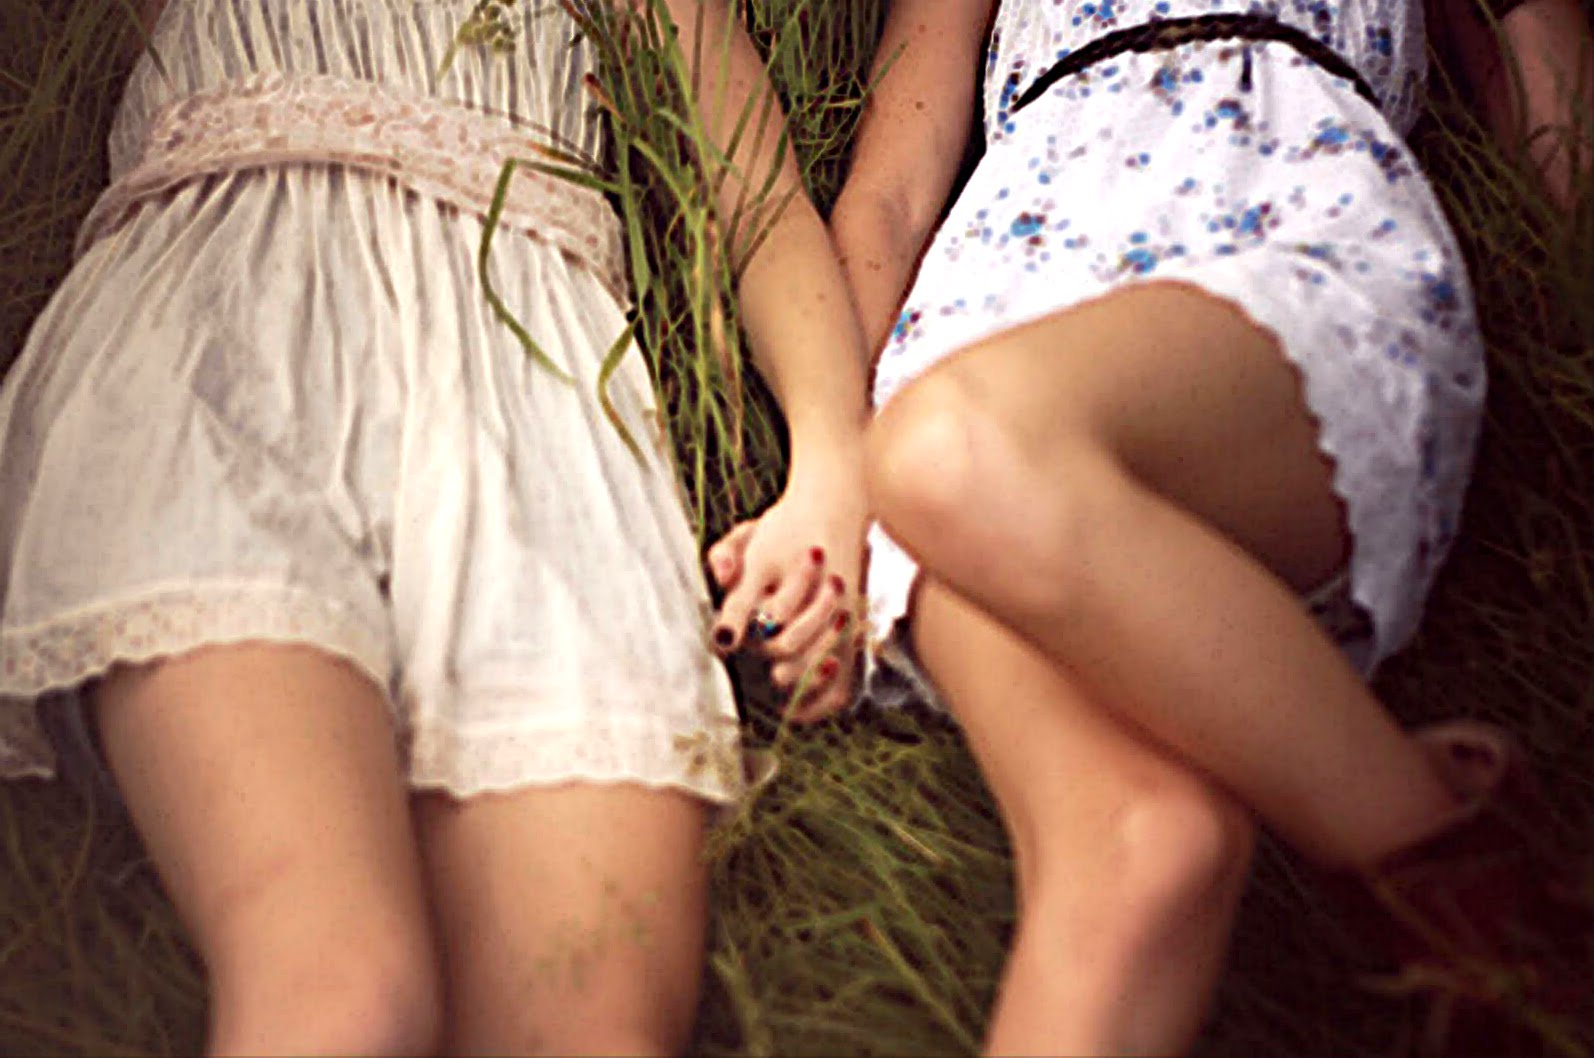 LesbianTeenNovels.jpg